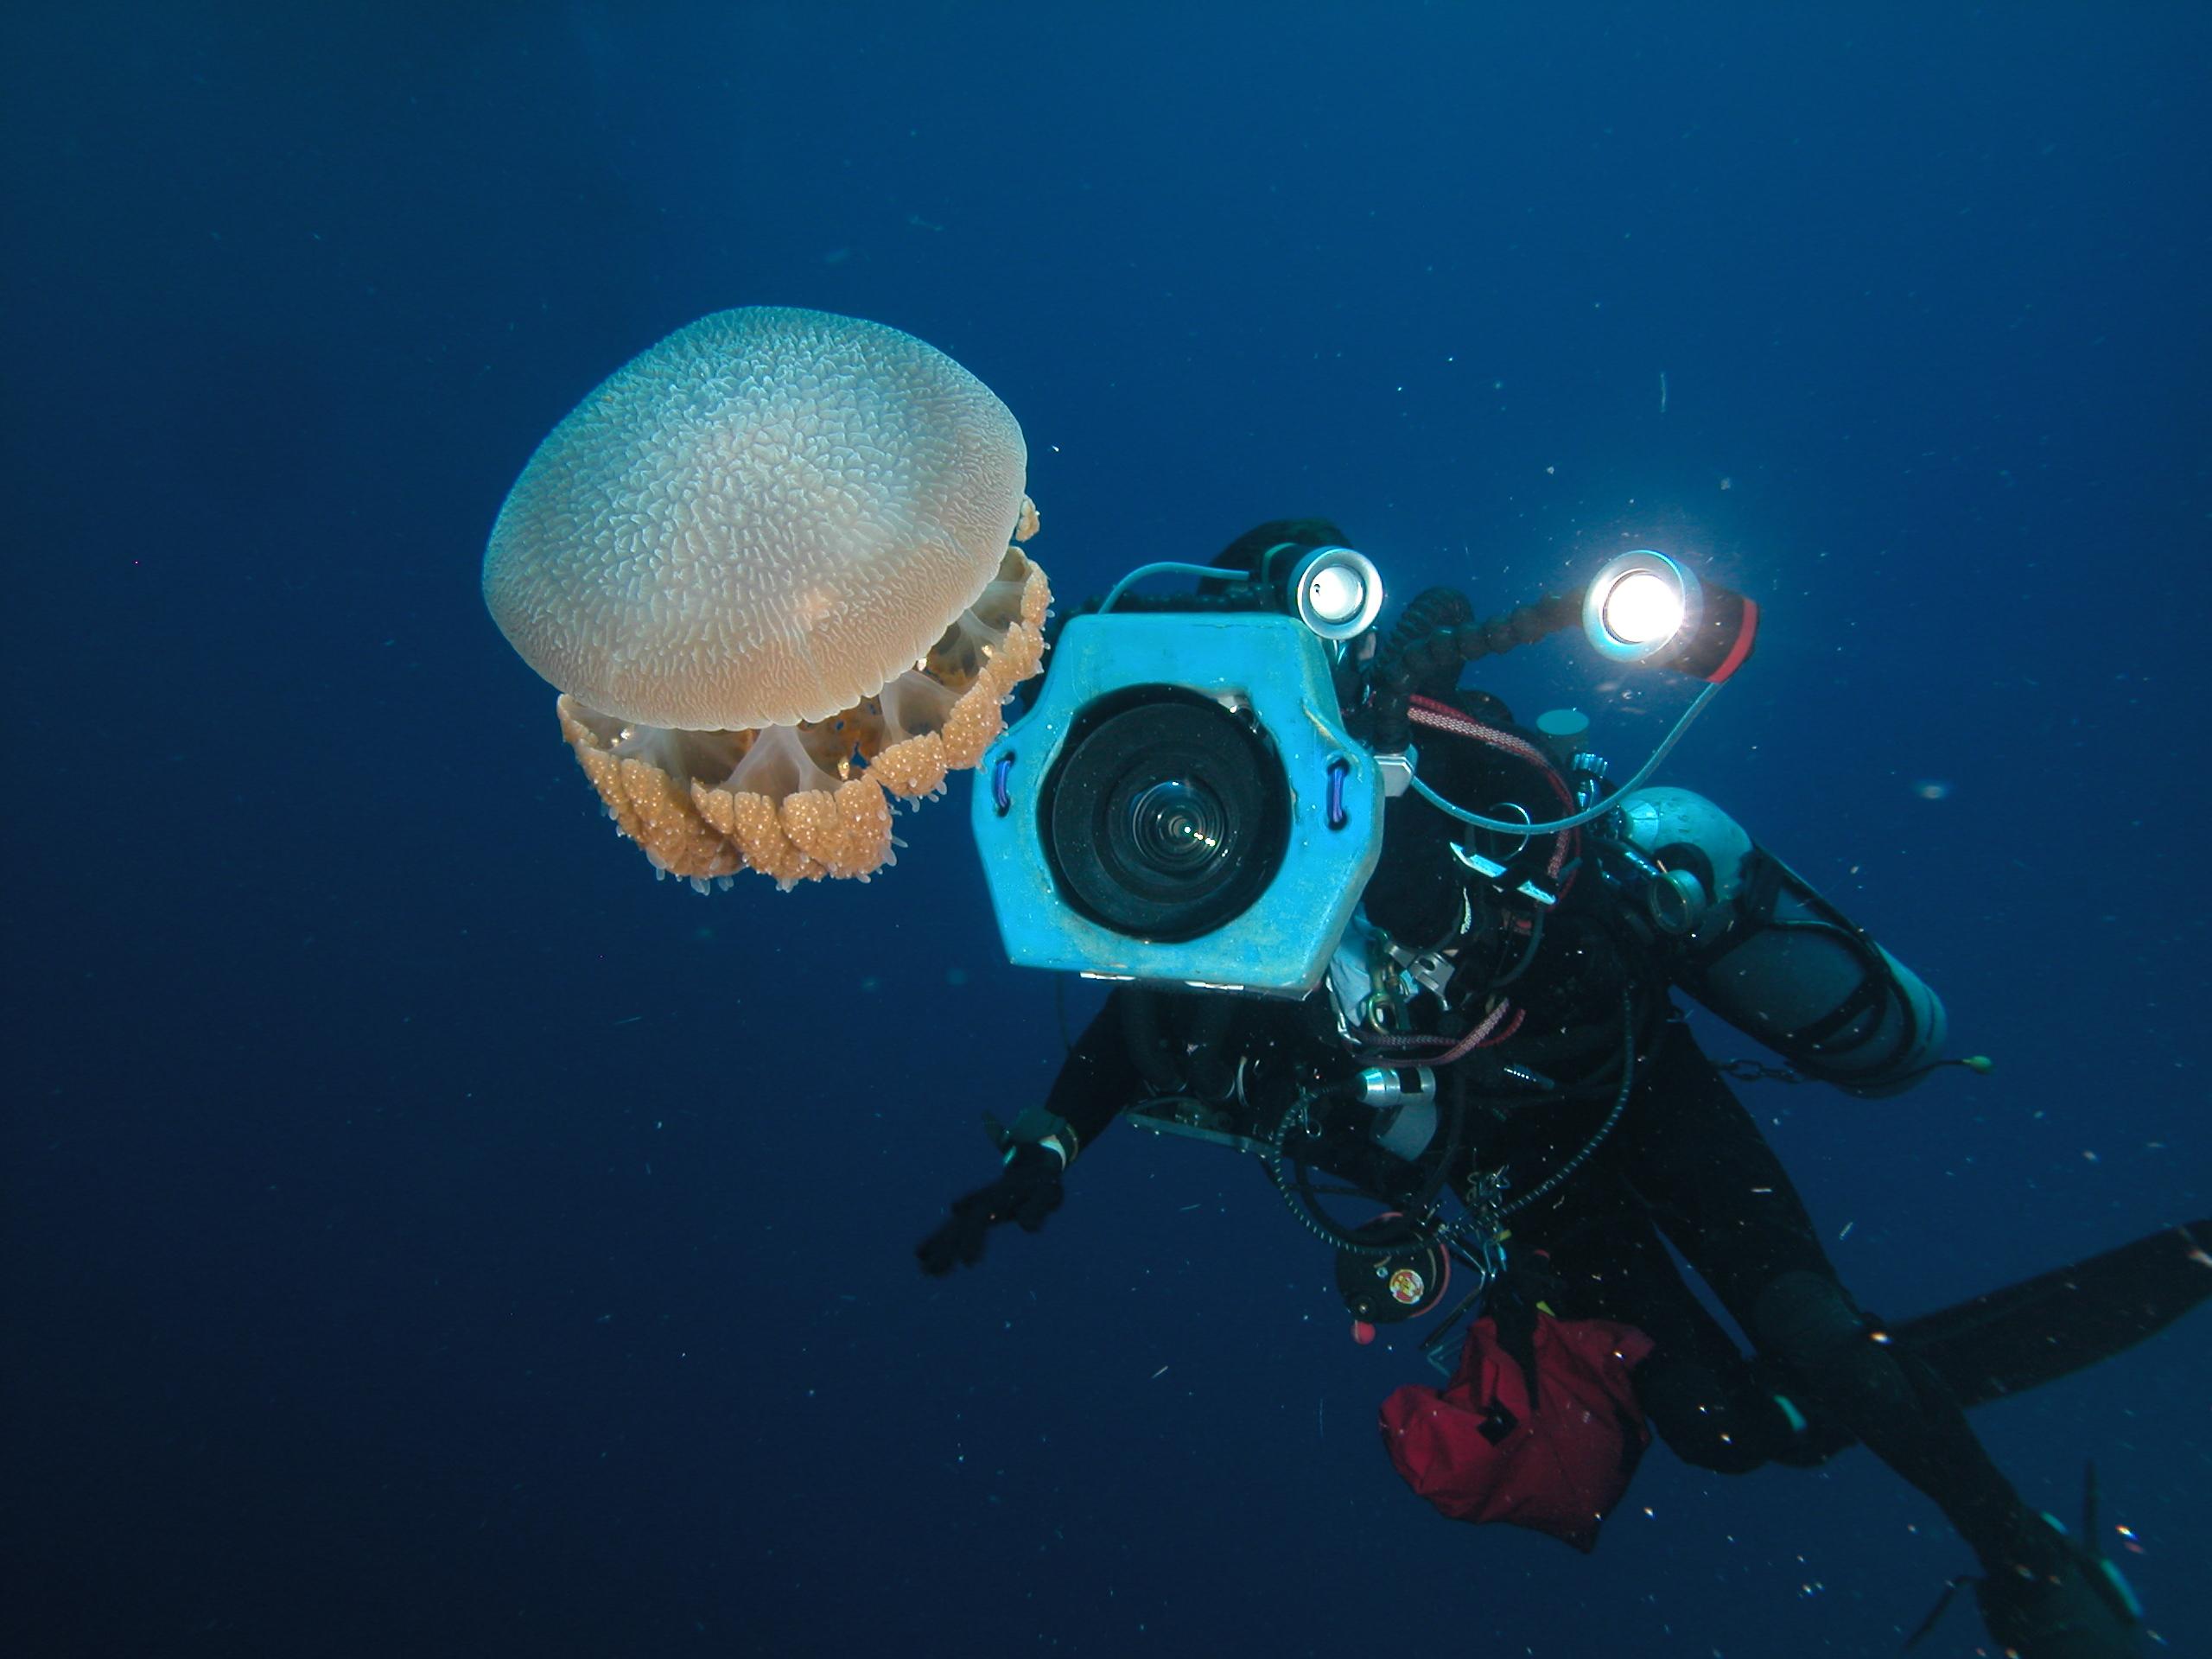 Jellyfish on deco